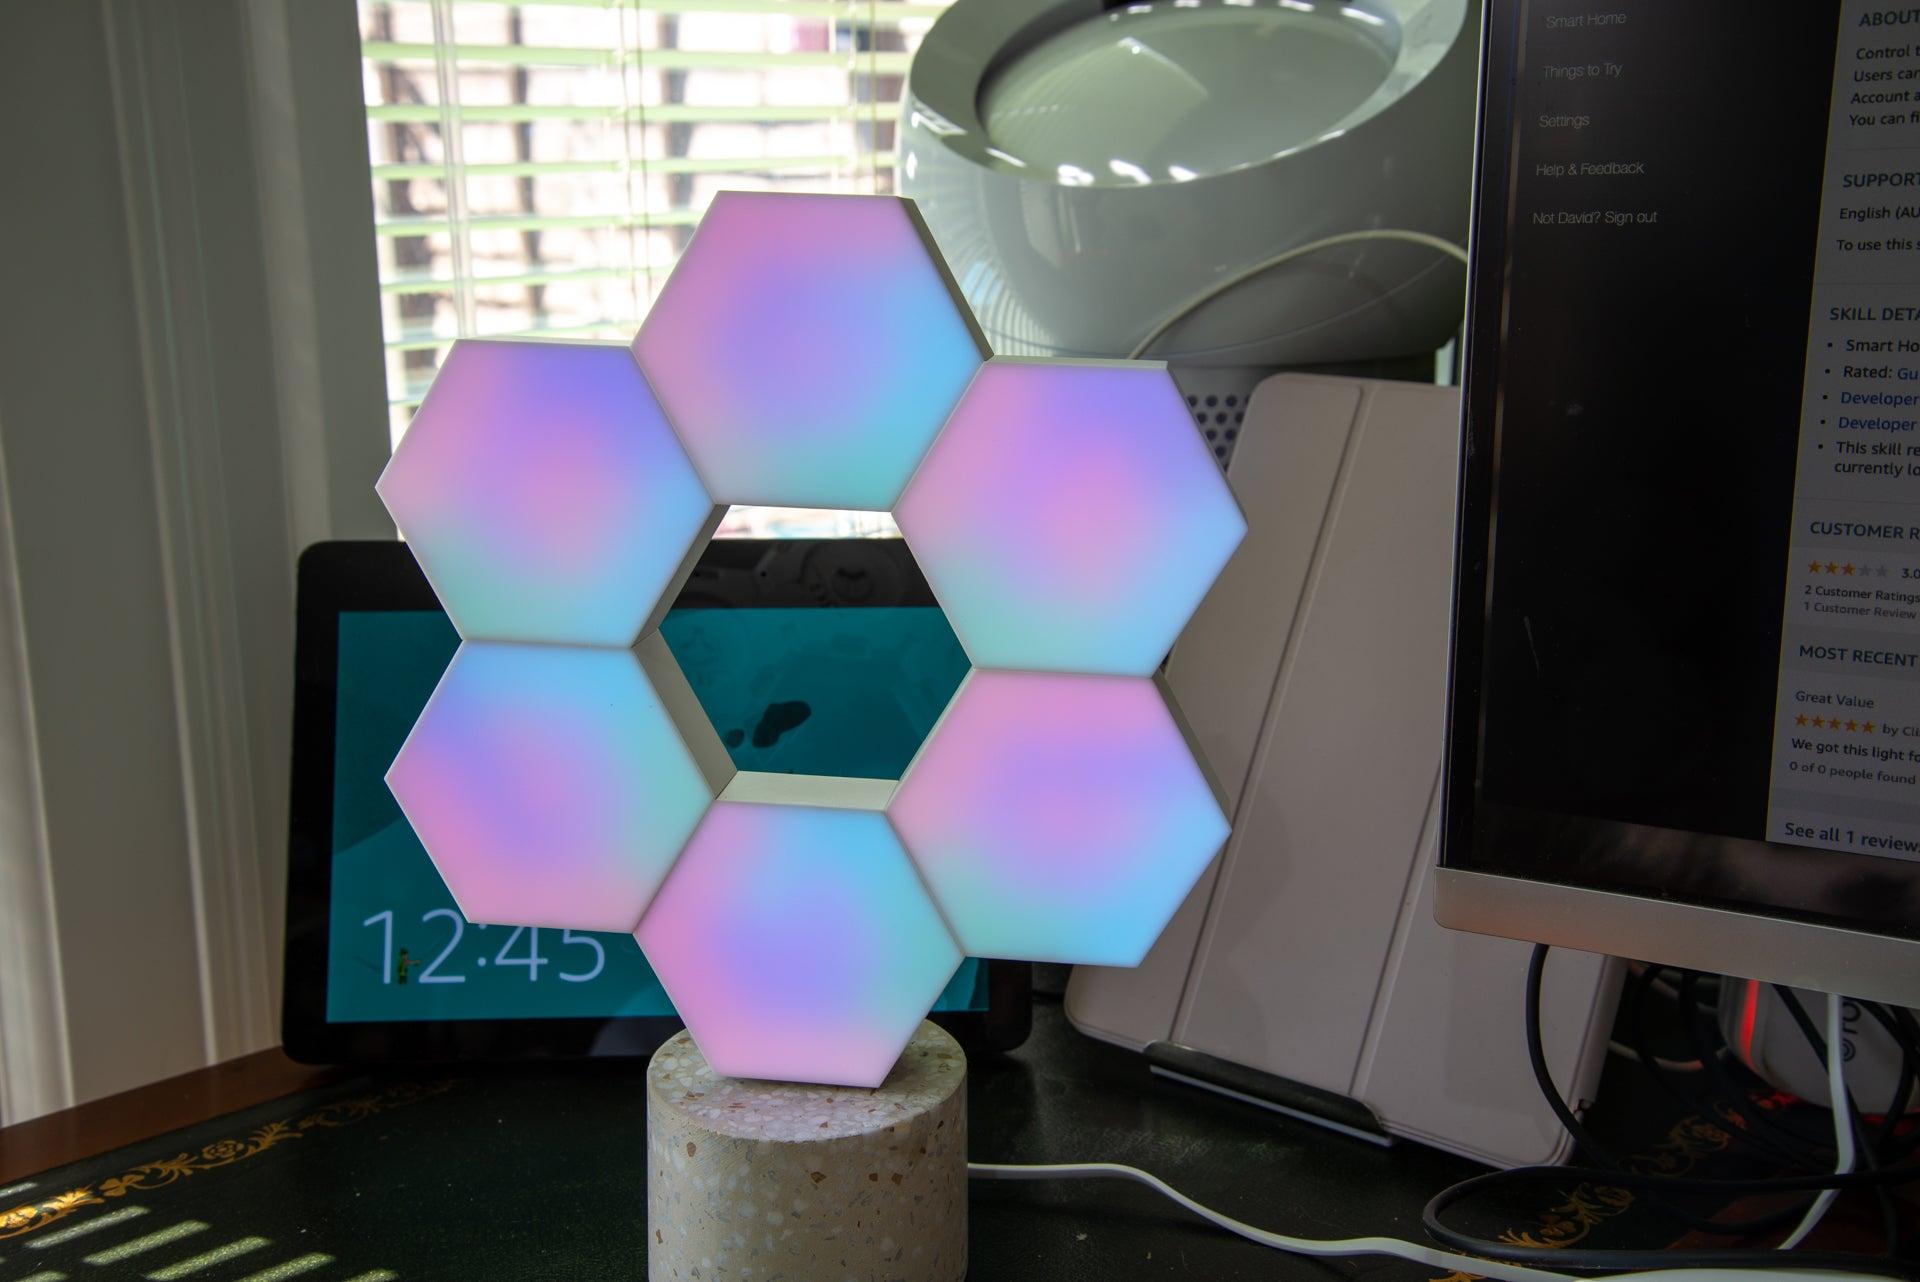 LifeSmart Cololight Pro colour pattern